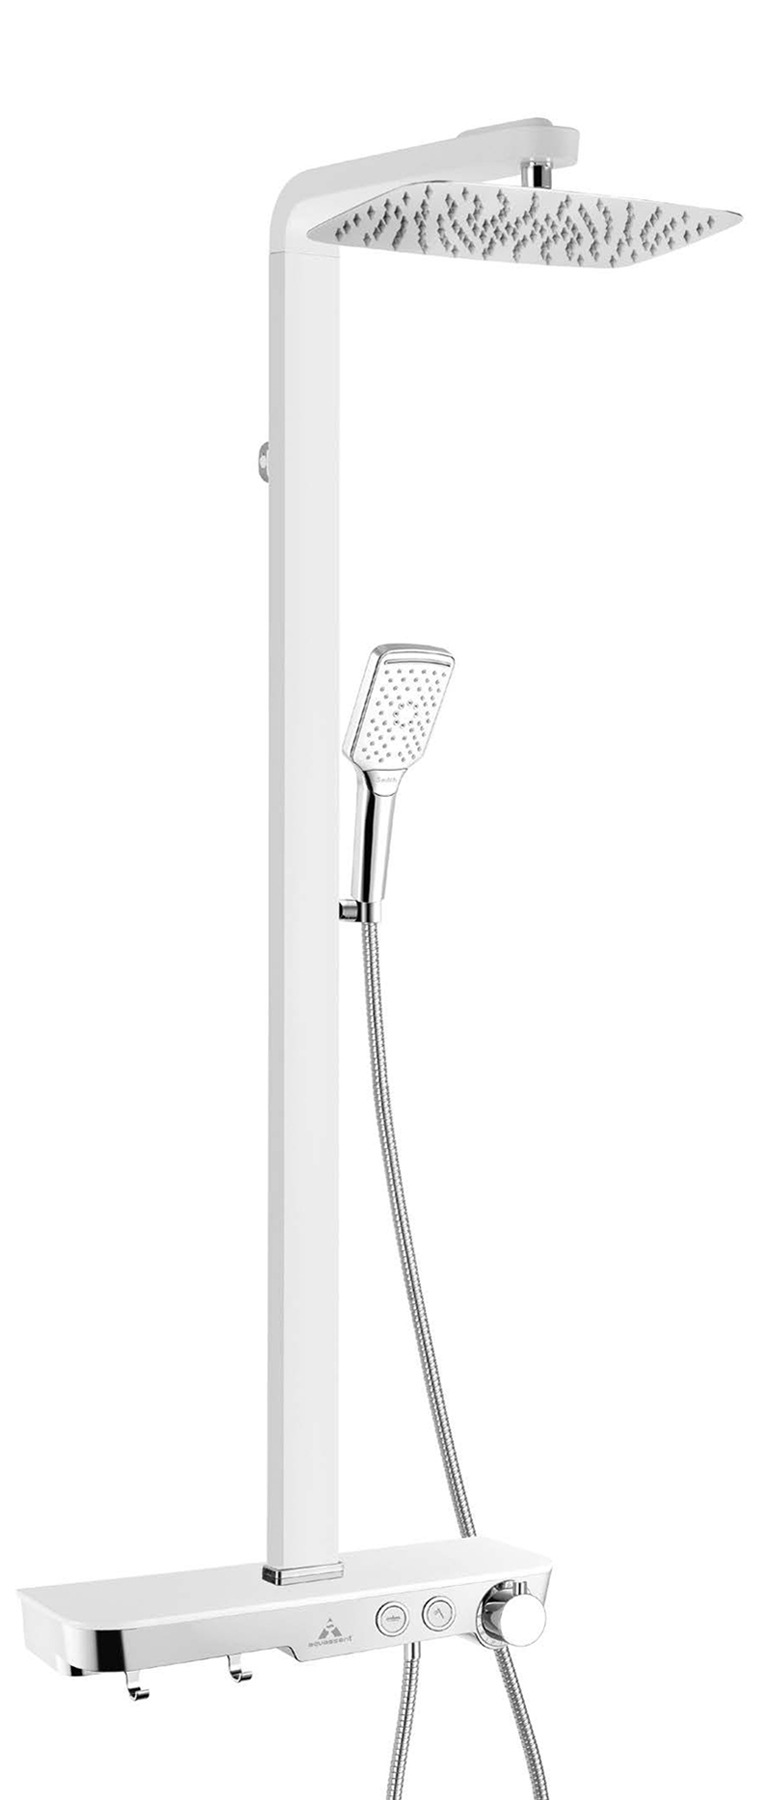 Conjuntos de ducha   System TOUCH      ARTIS